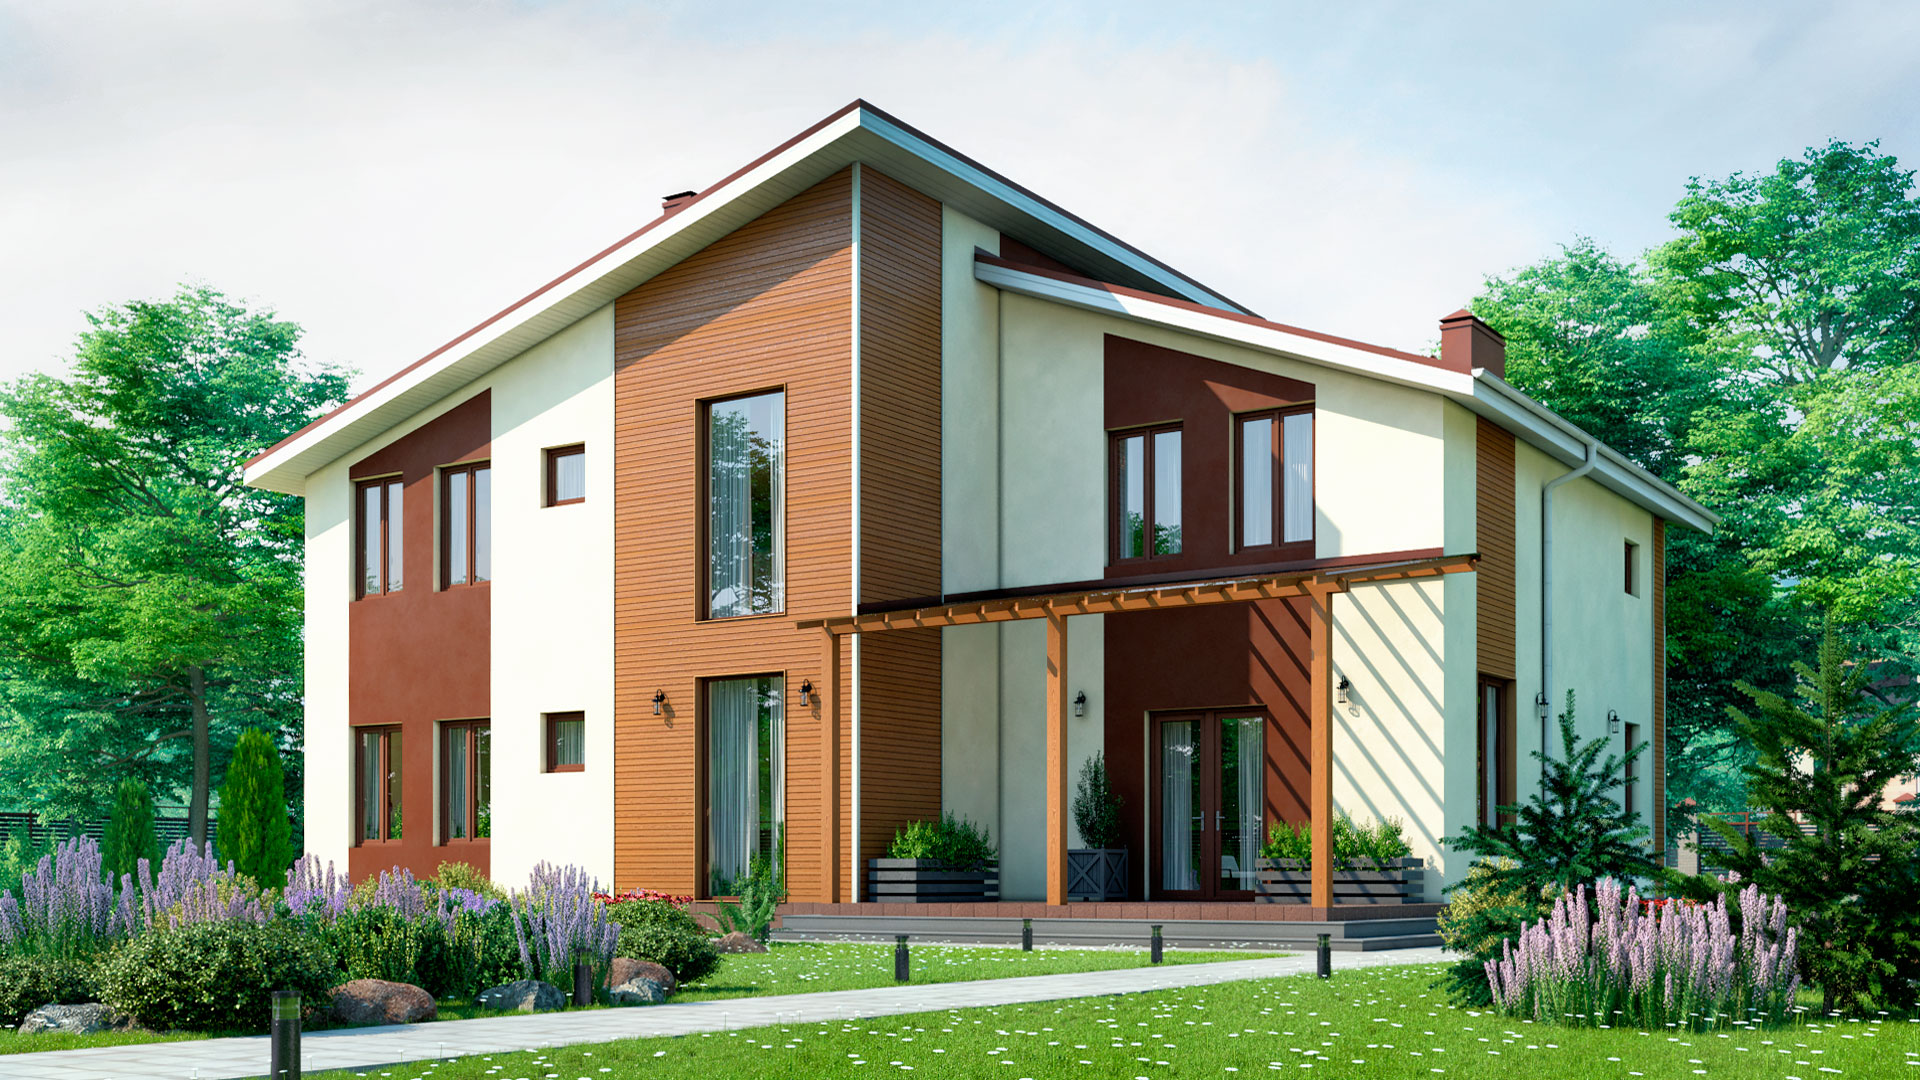 Передний фасад двухэтажного загородного коттеджа, проект БЭНПАН БП-296/4.